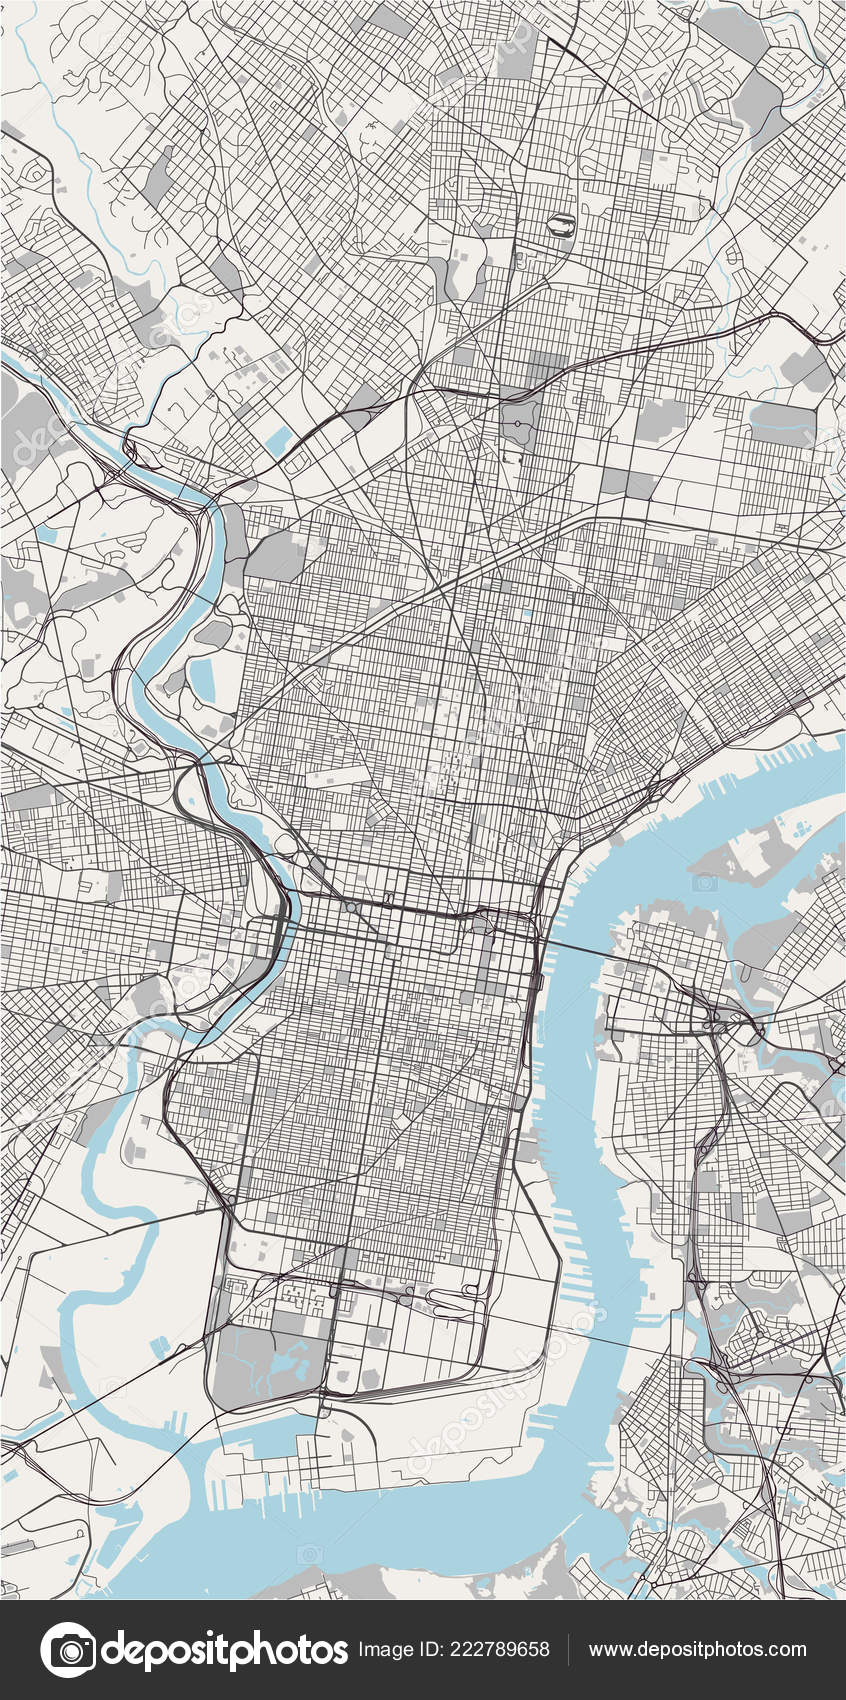 Pennsylvania In Usa Map.Illustration Map City Philadelphia Pennsylvania Usa Stock Vector